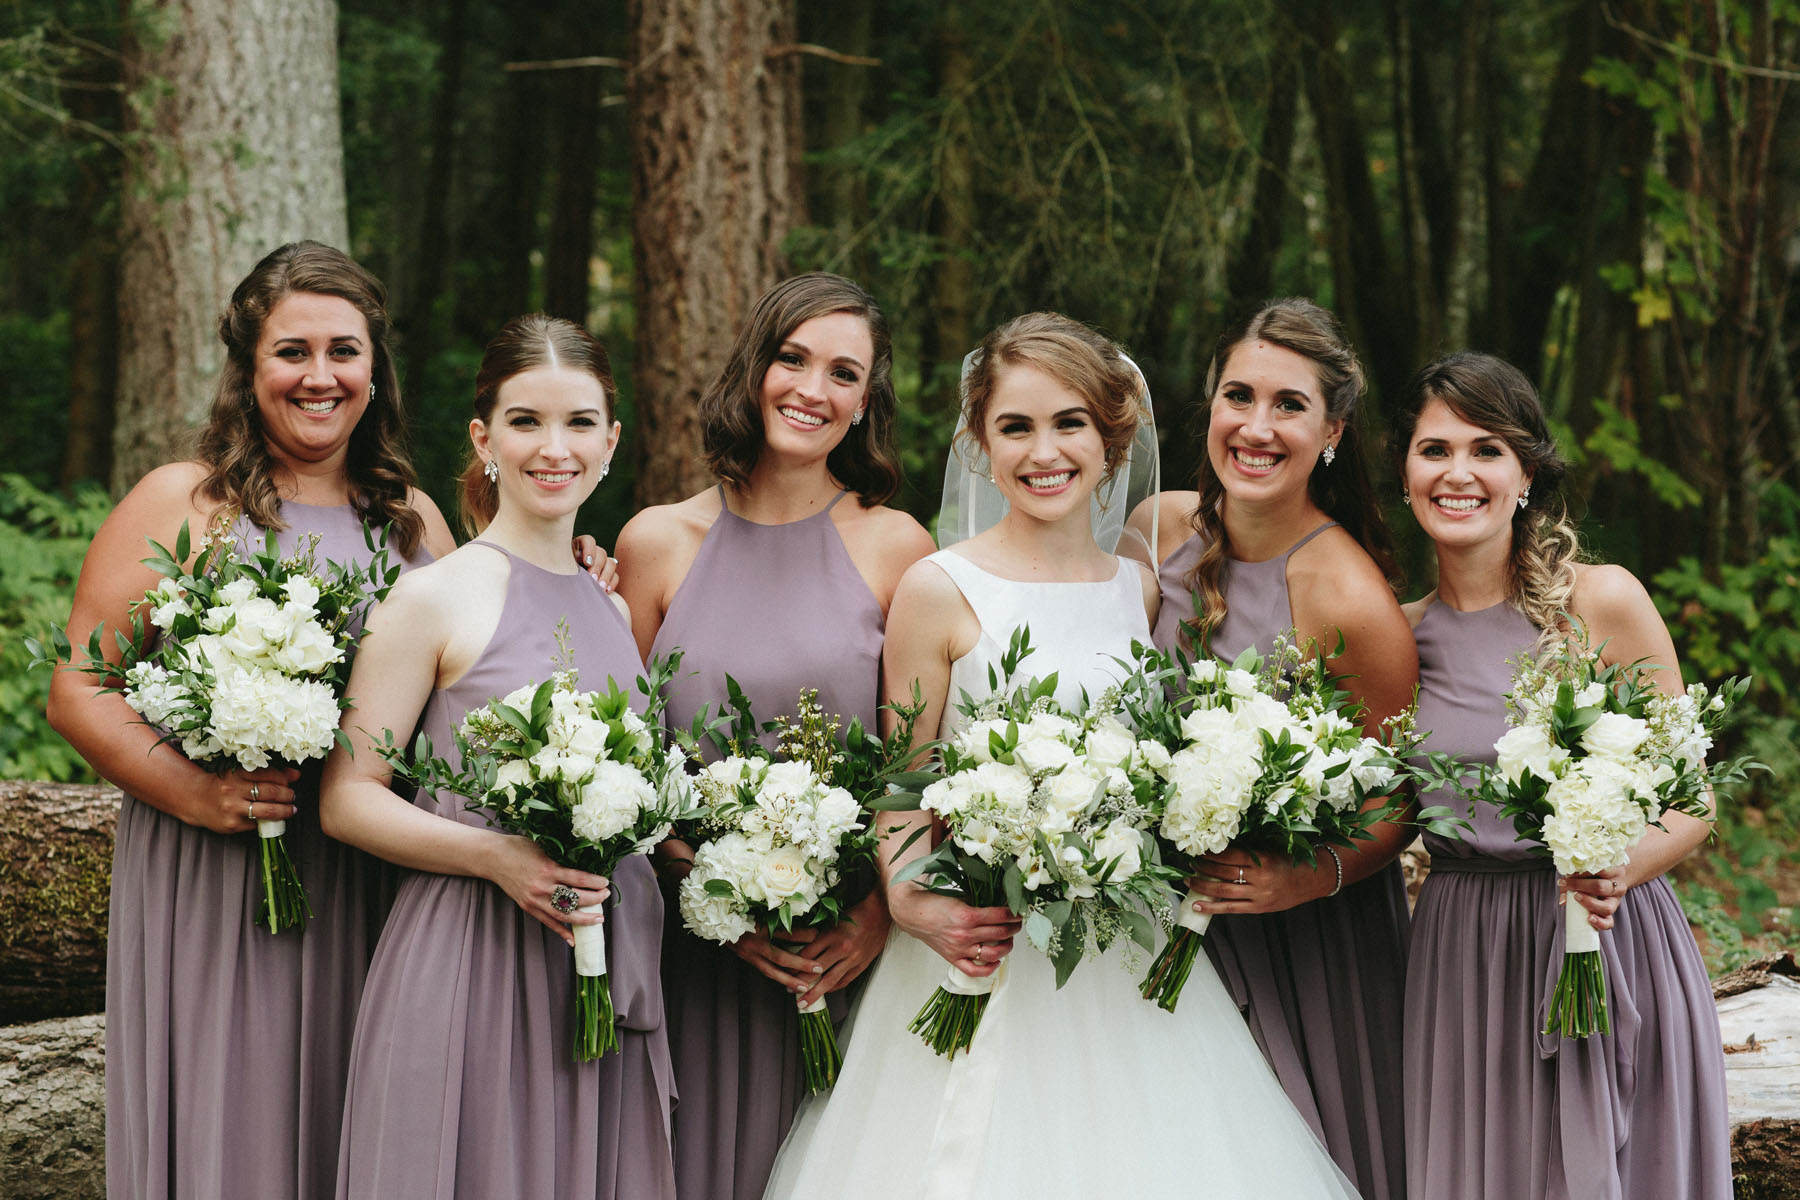 thetis-island-wedding-photographer-rp-rn-108.jpg